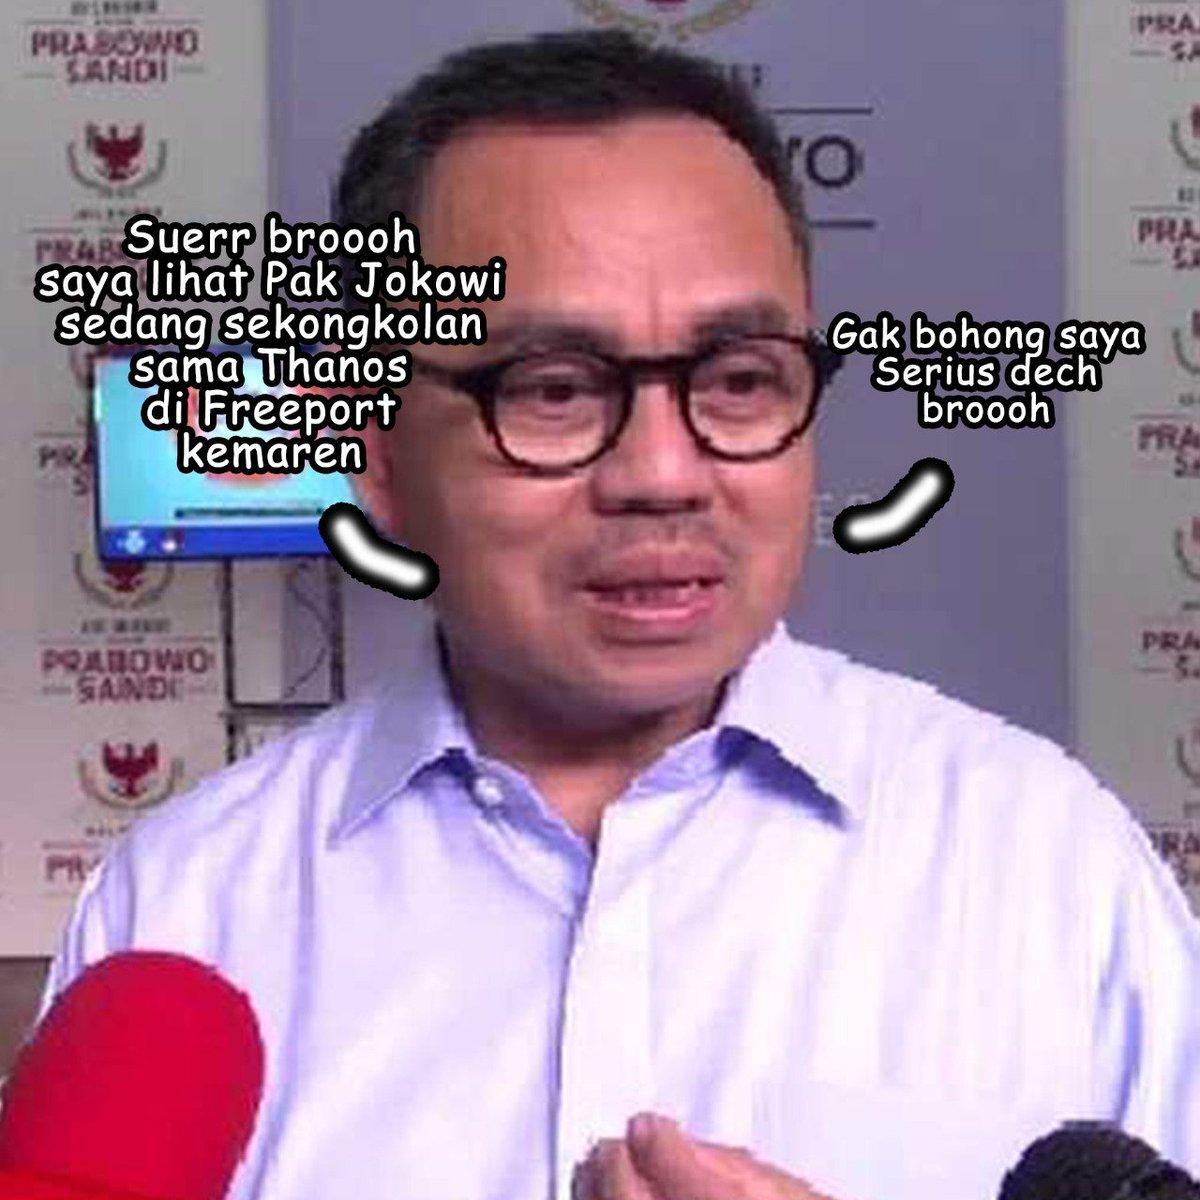 Silahkan bohongnya dimaksimalkan lagi #SudirmanSaidHalu #JokowiLagi